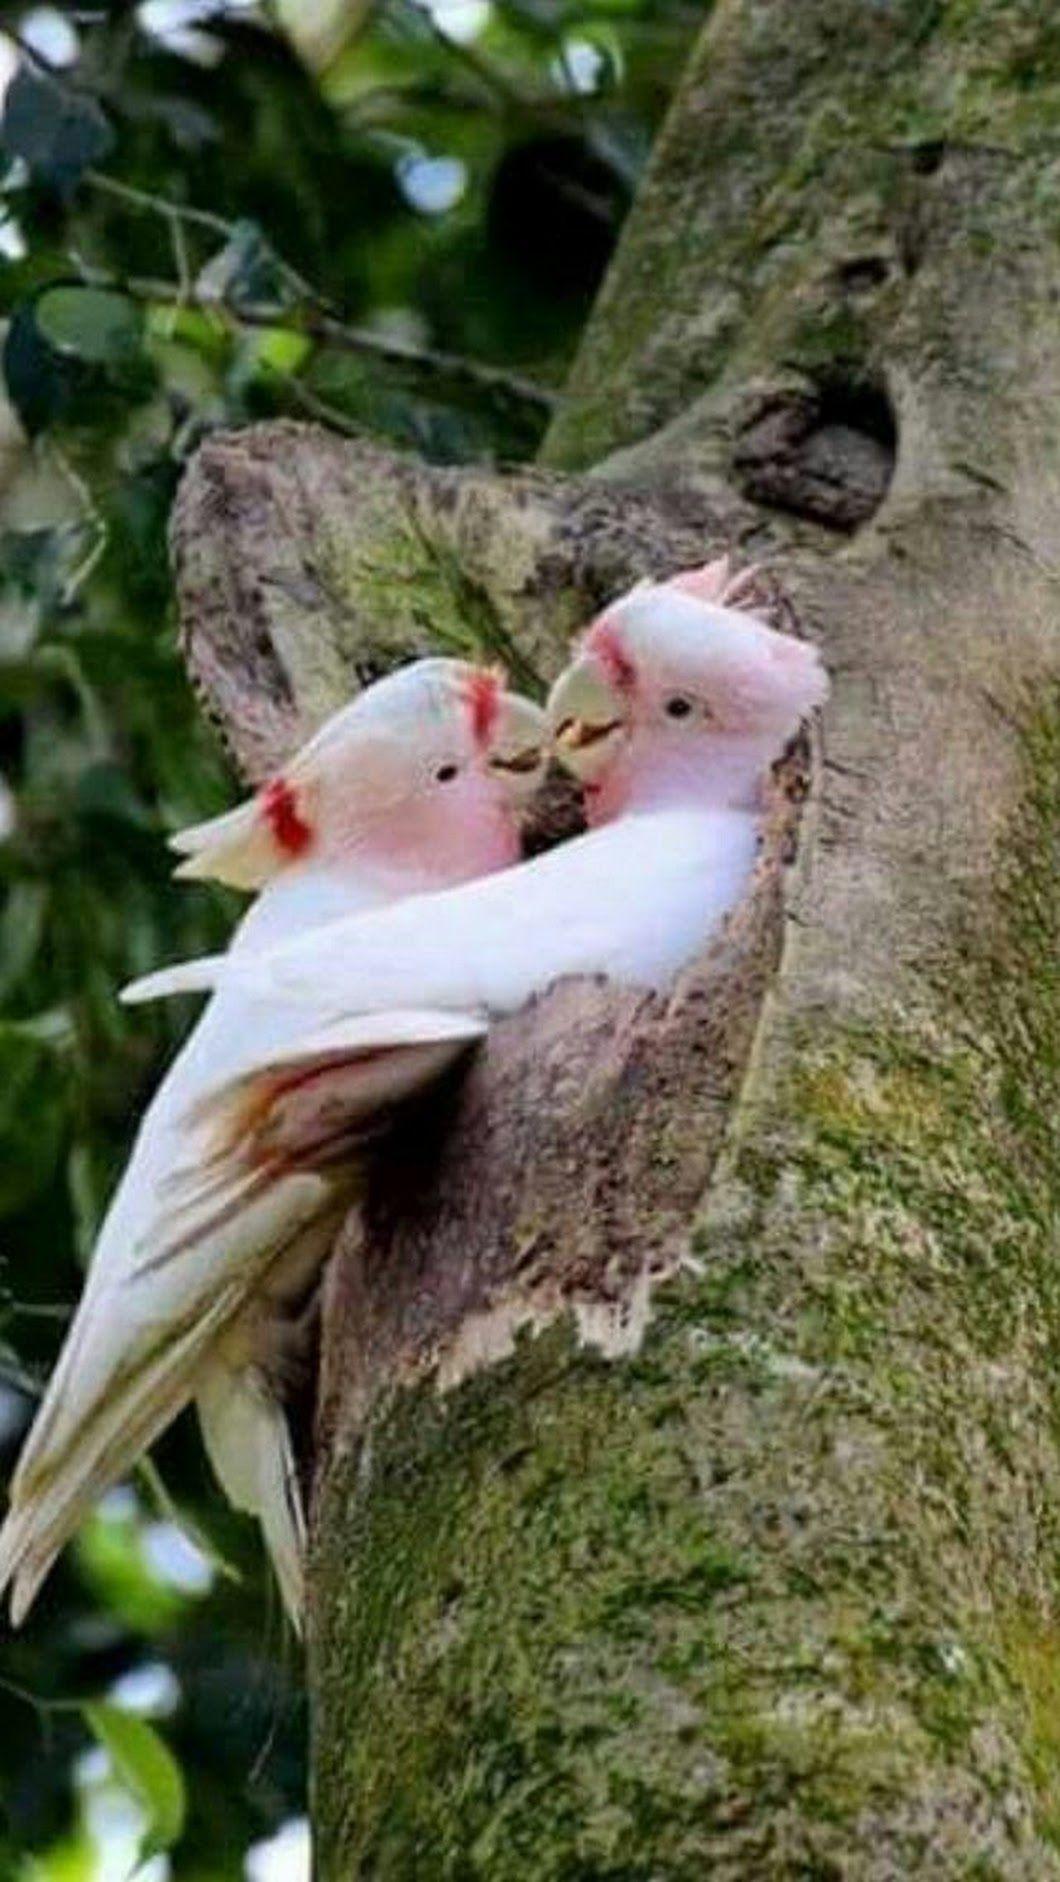 предбаннике фото поцелуя птички автоматического станка